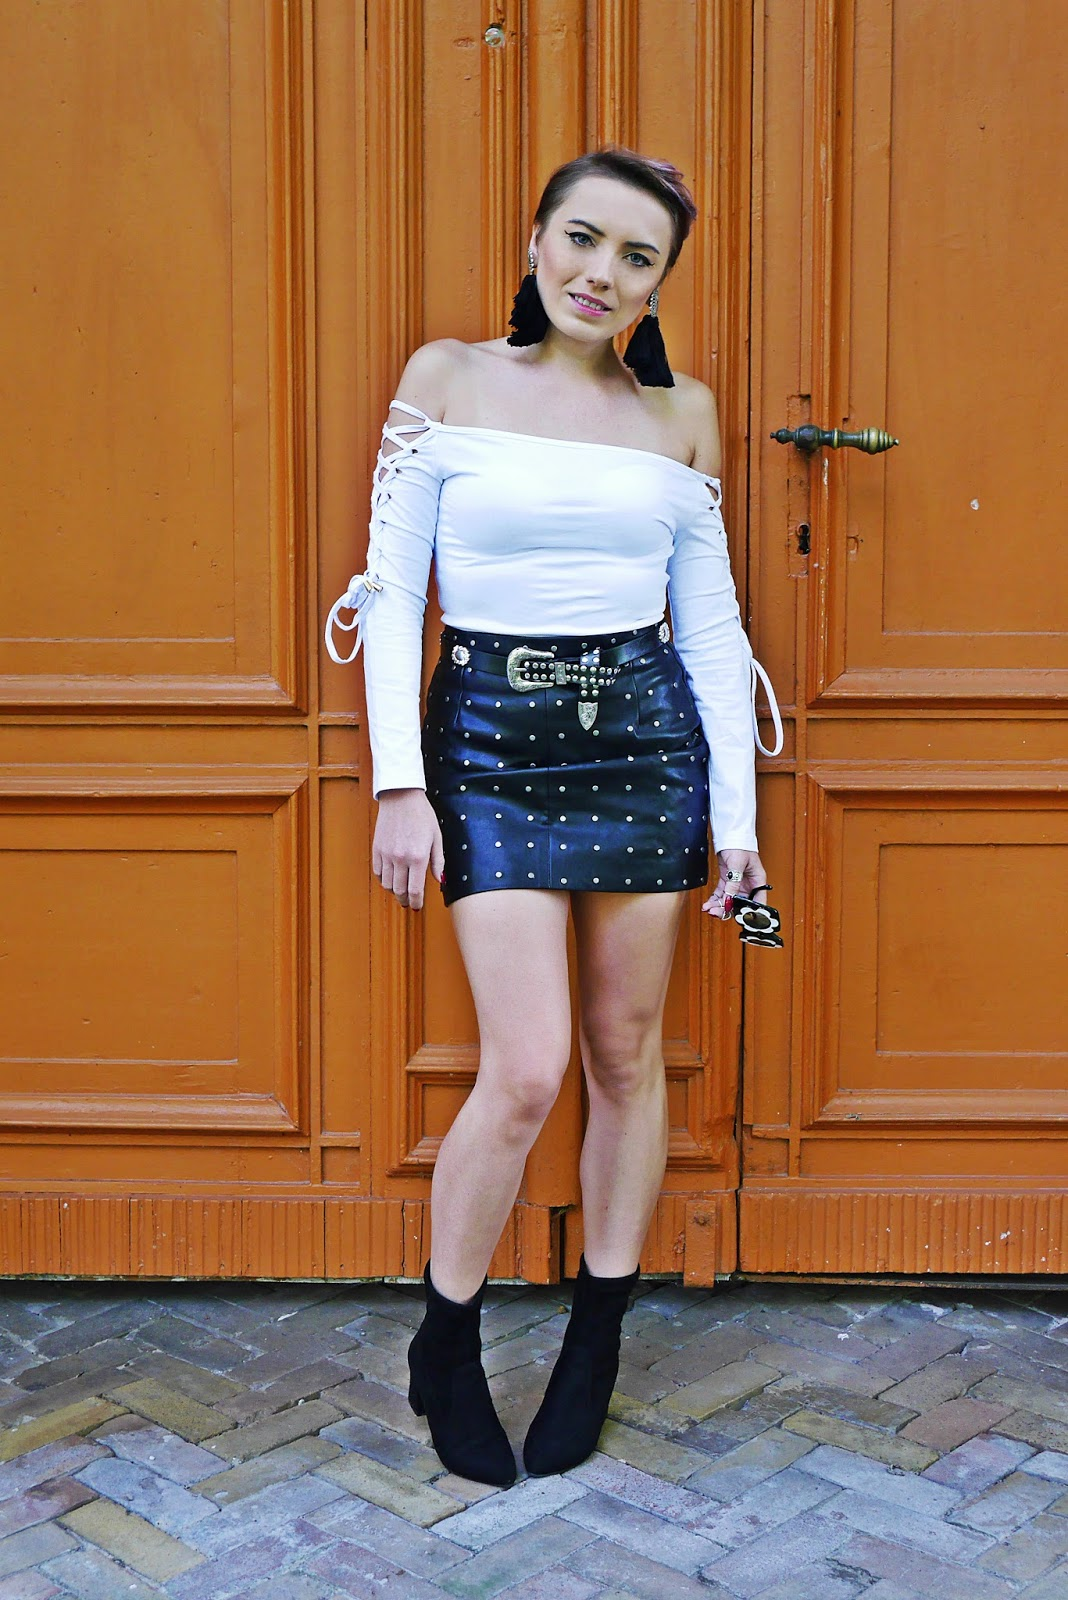 4_flower_sunglass_leather_skirt_socks_shoes_belt_white_top_karyn_blog_modowy_110917aa